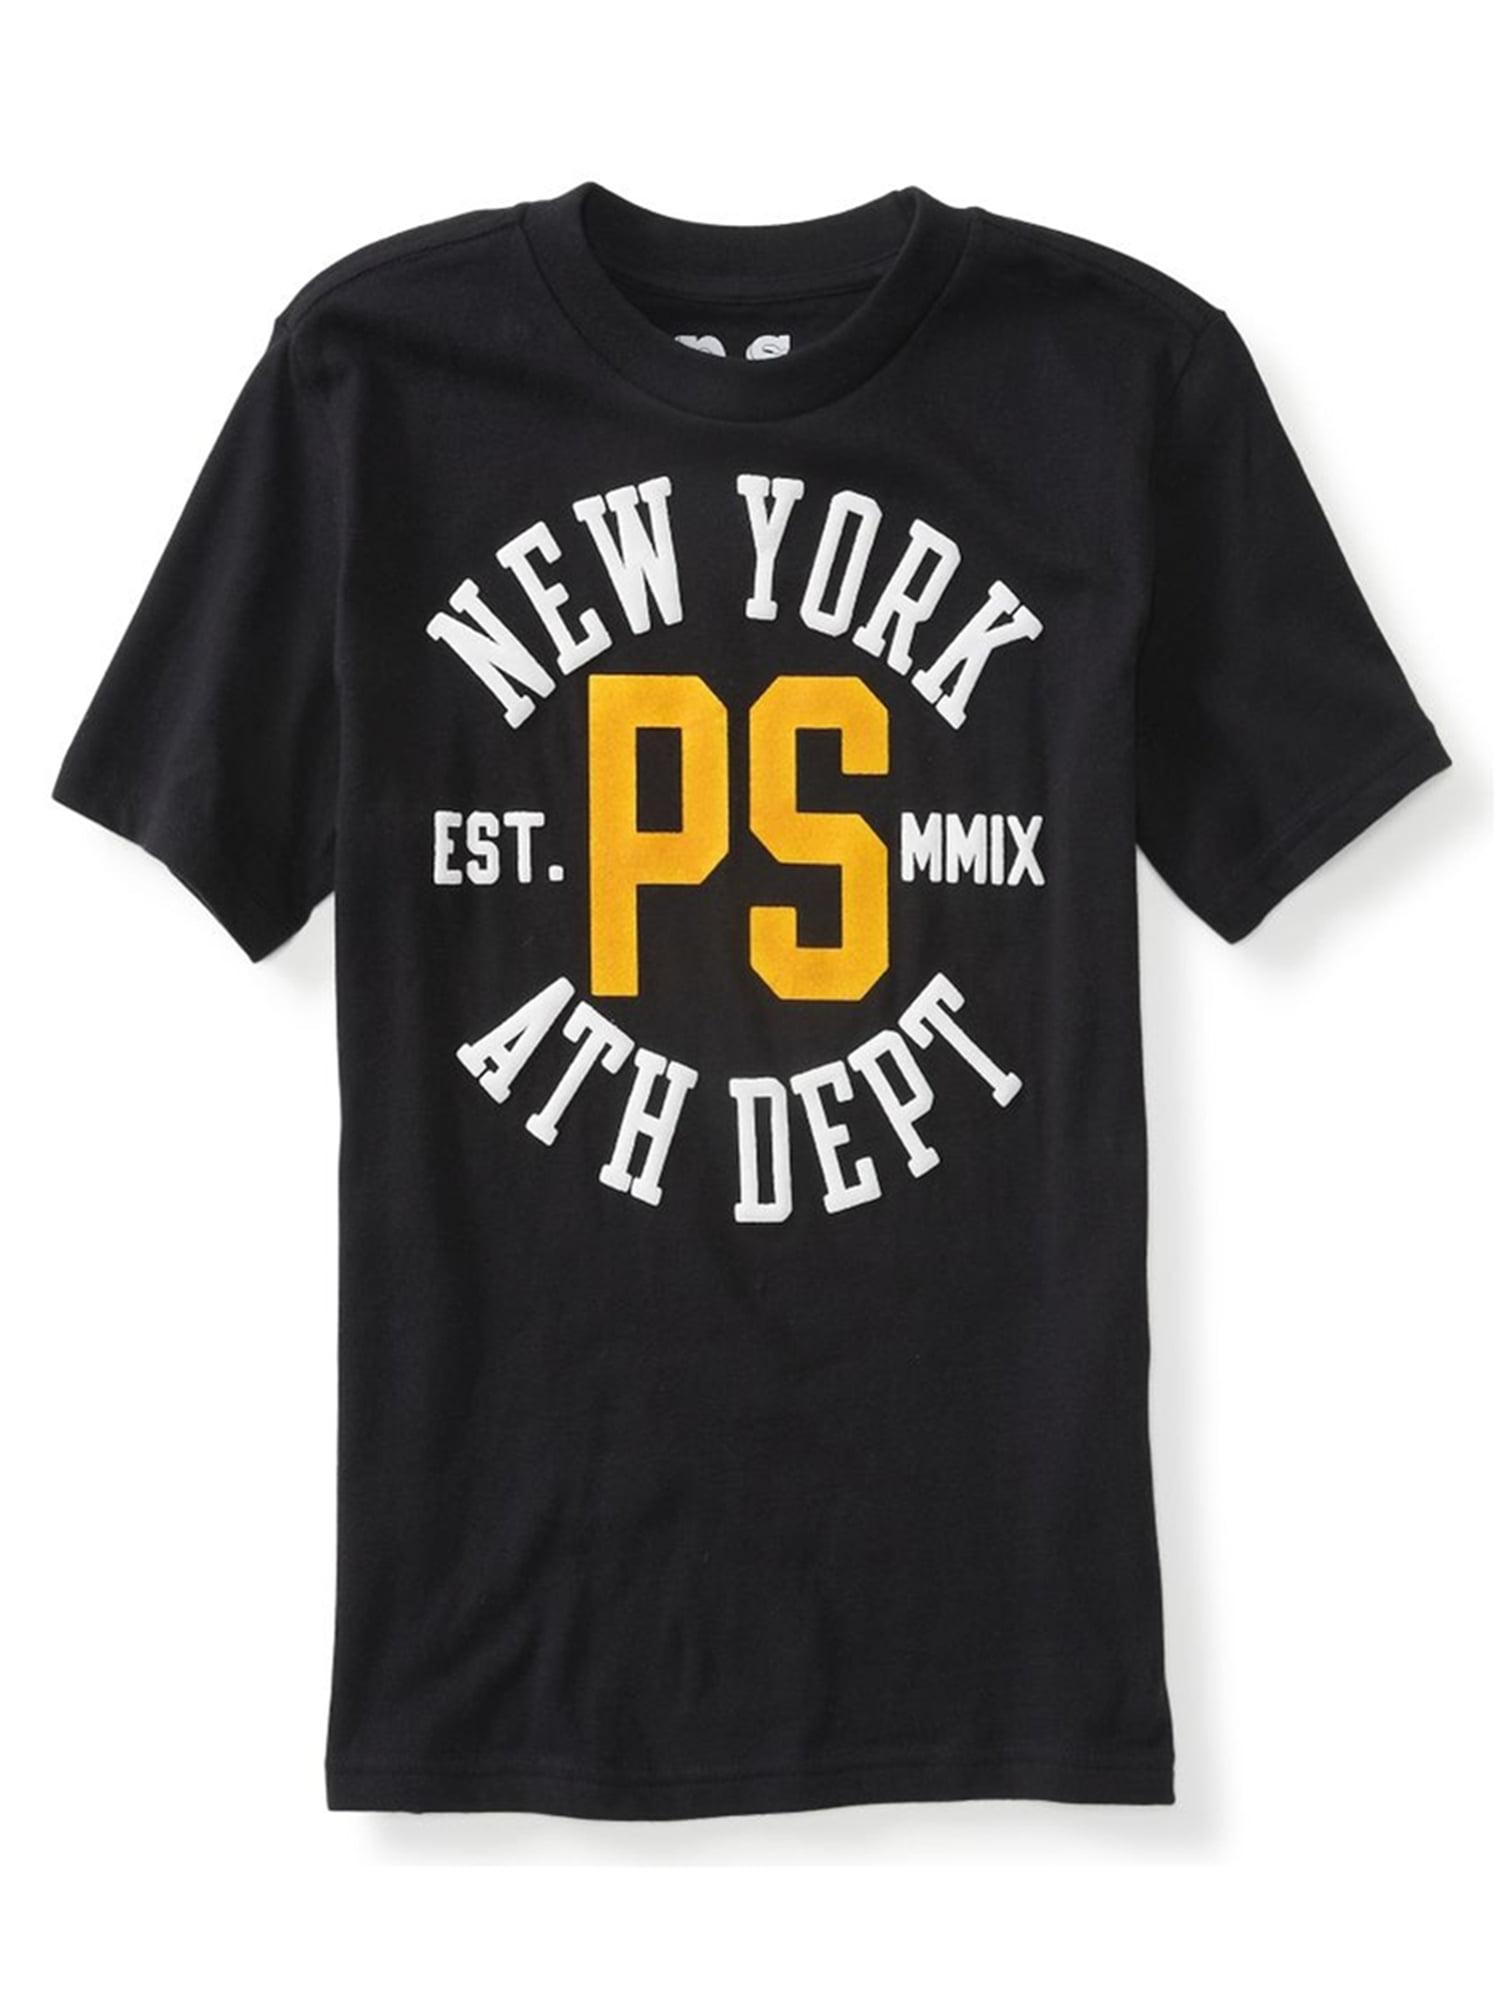 Aeropostale Boys Ps Ath. Dep. Graphic T-Shirt